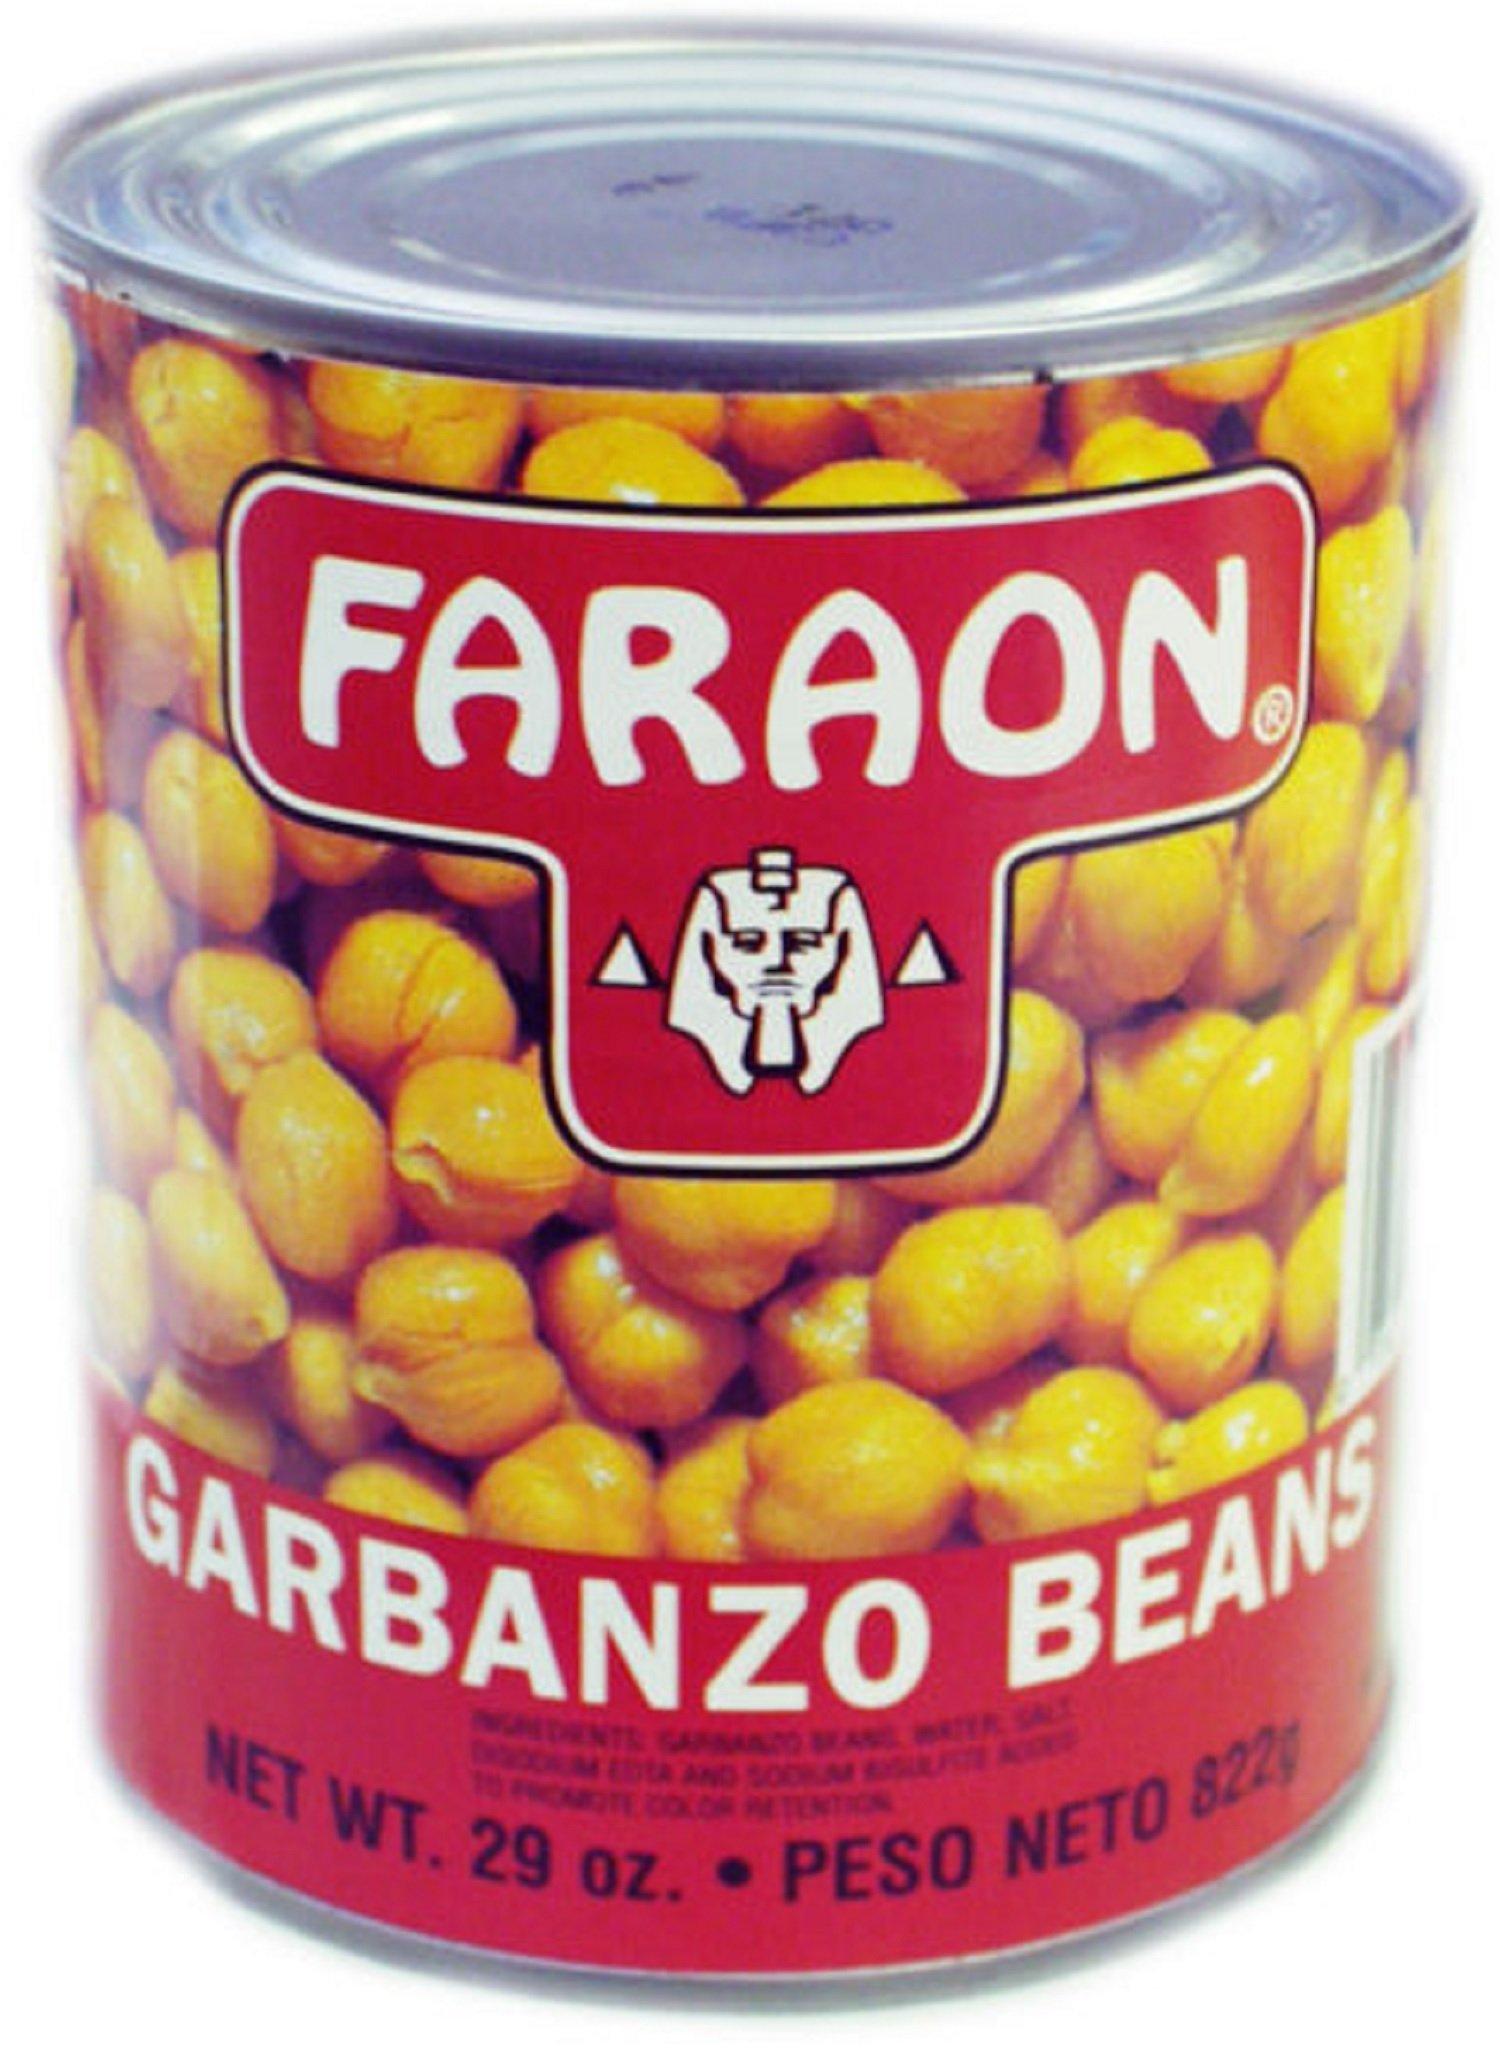 FARAON Garbanzos, 29 Ounce (Pack of 12)